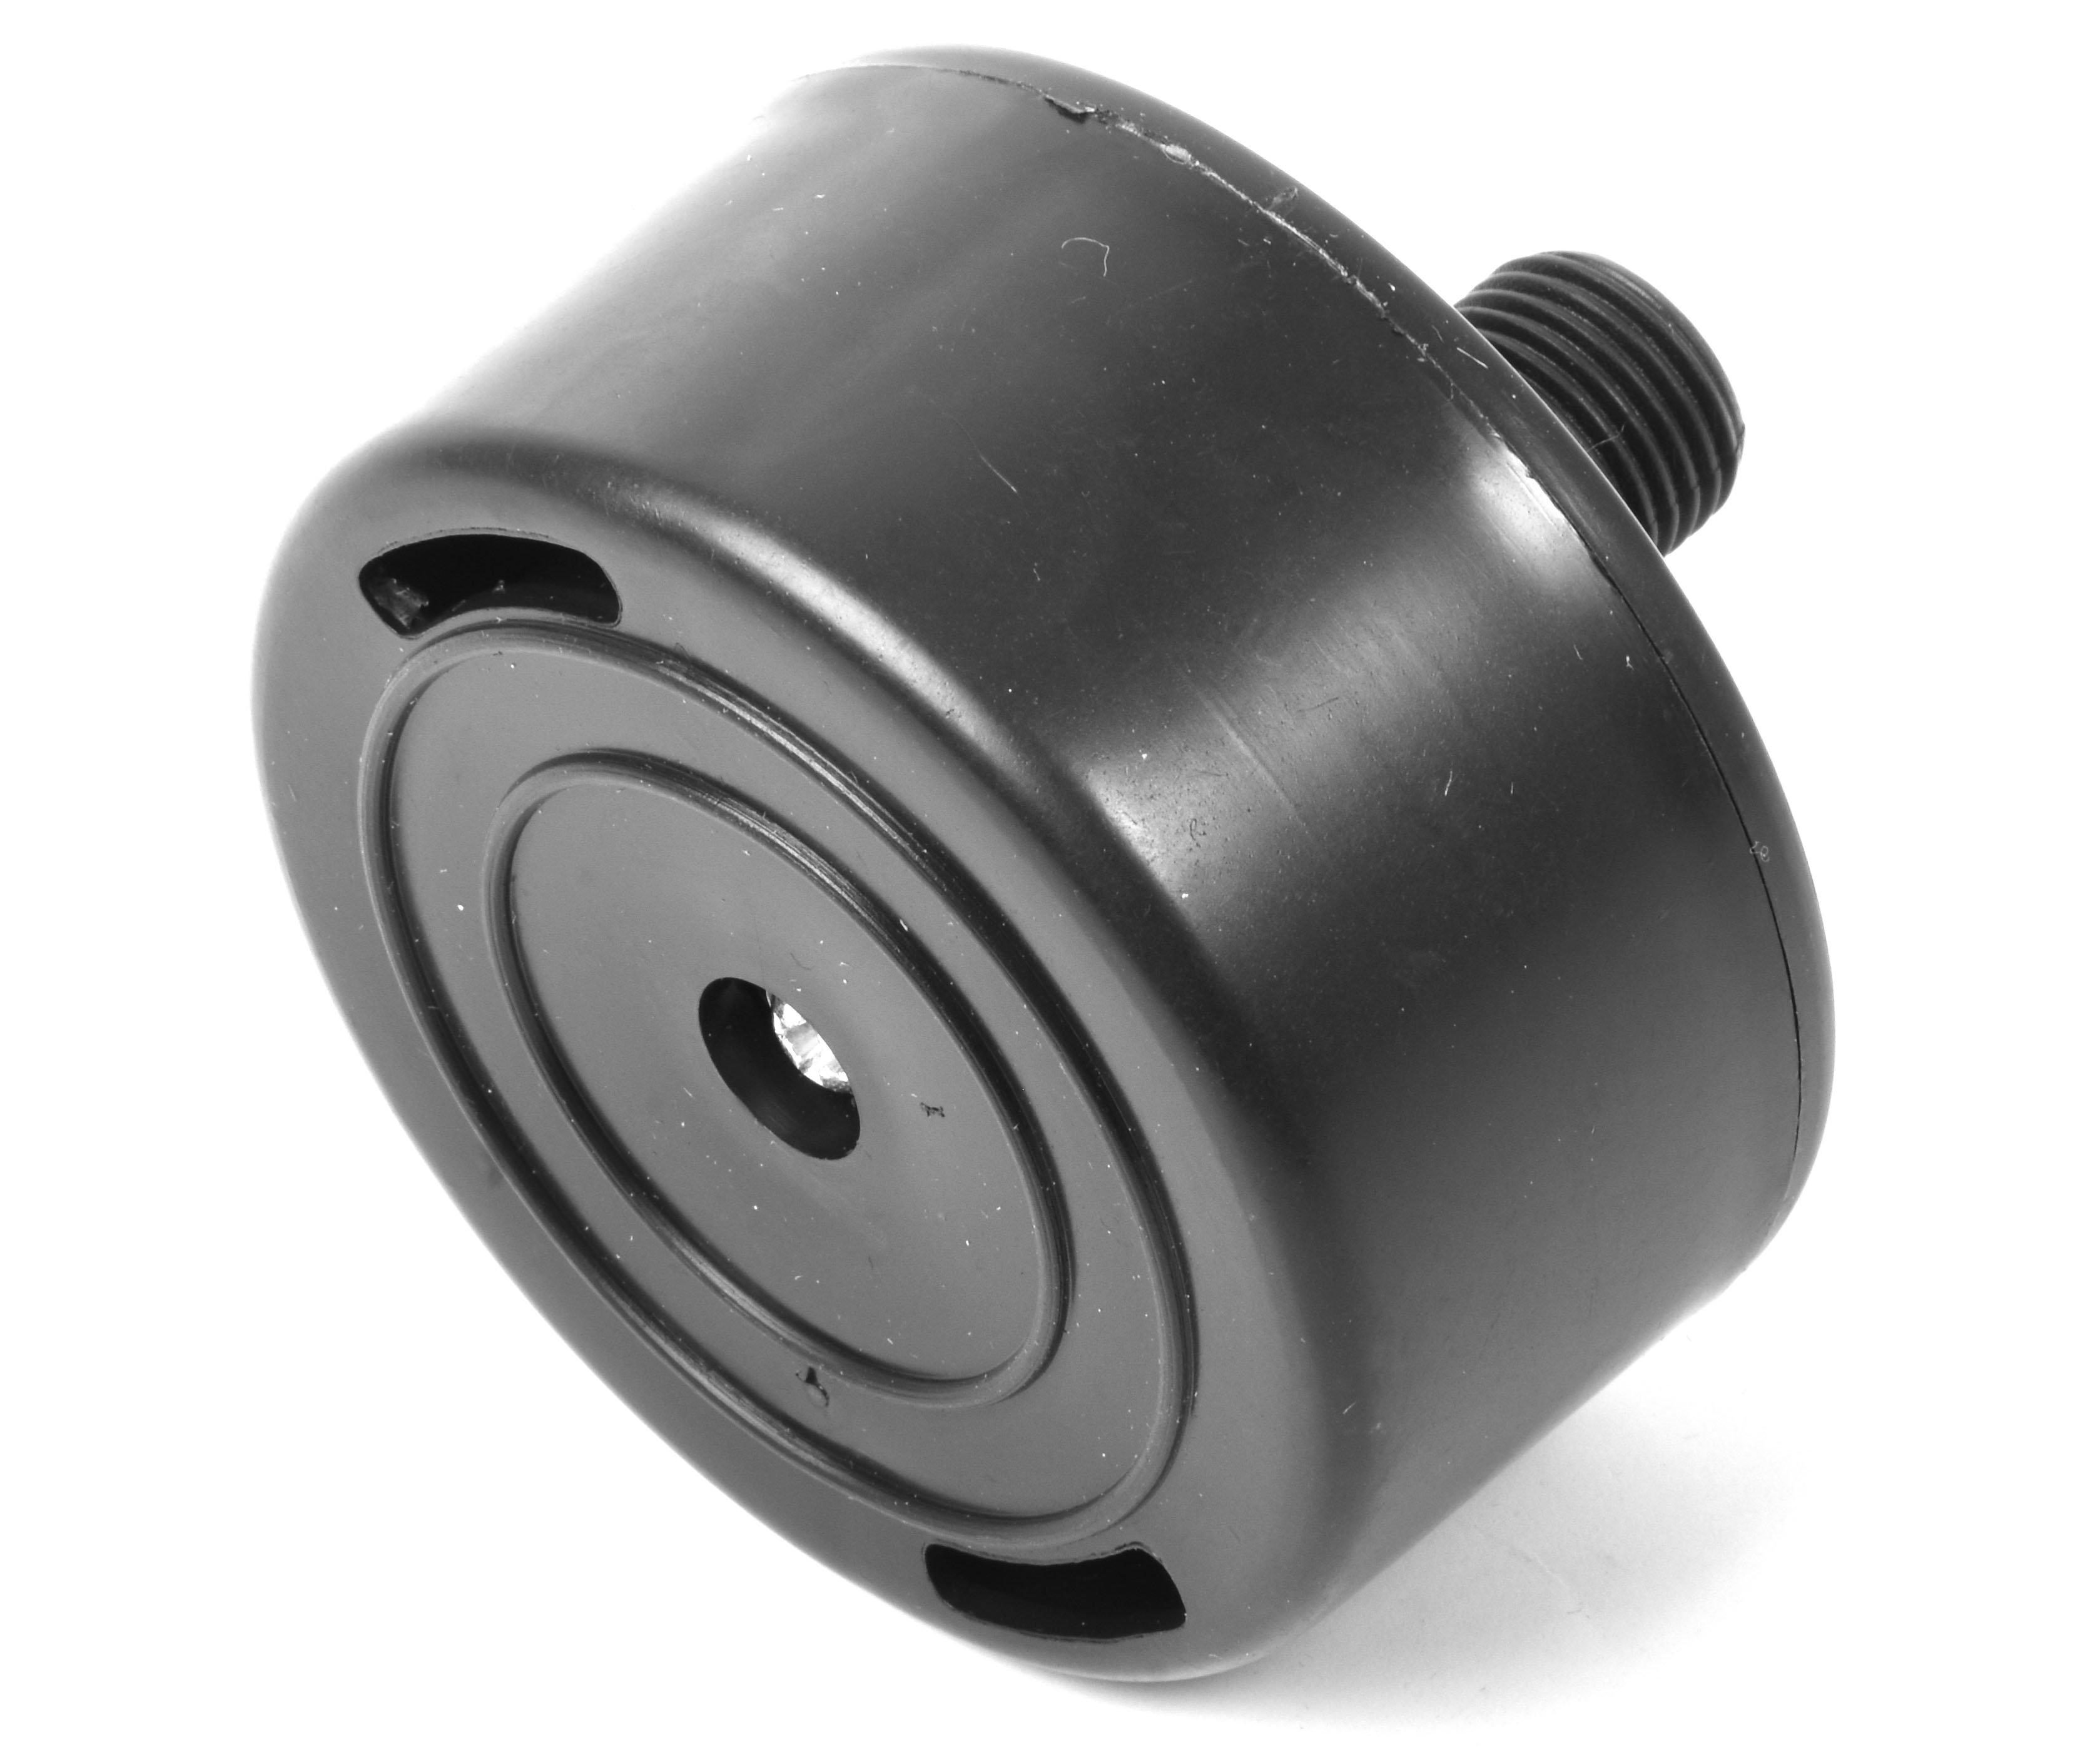 Filtr kompresoru HC 25,HC 52 dc,HC 53 dc,HC 54 Scheppach